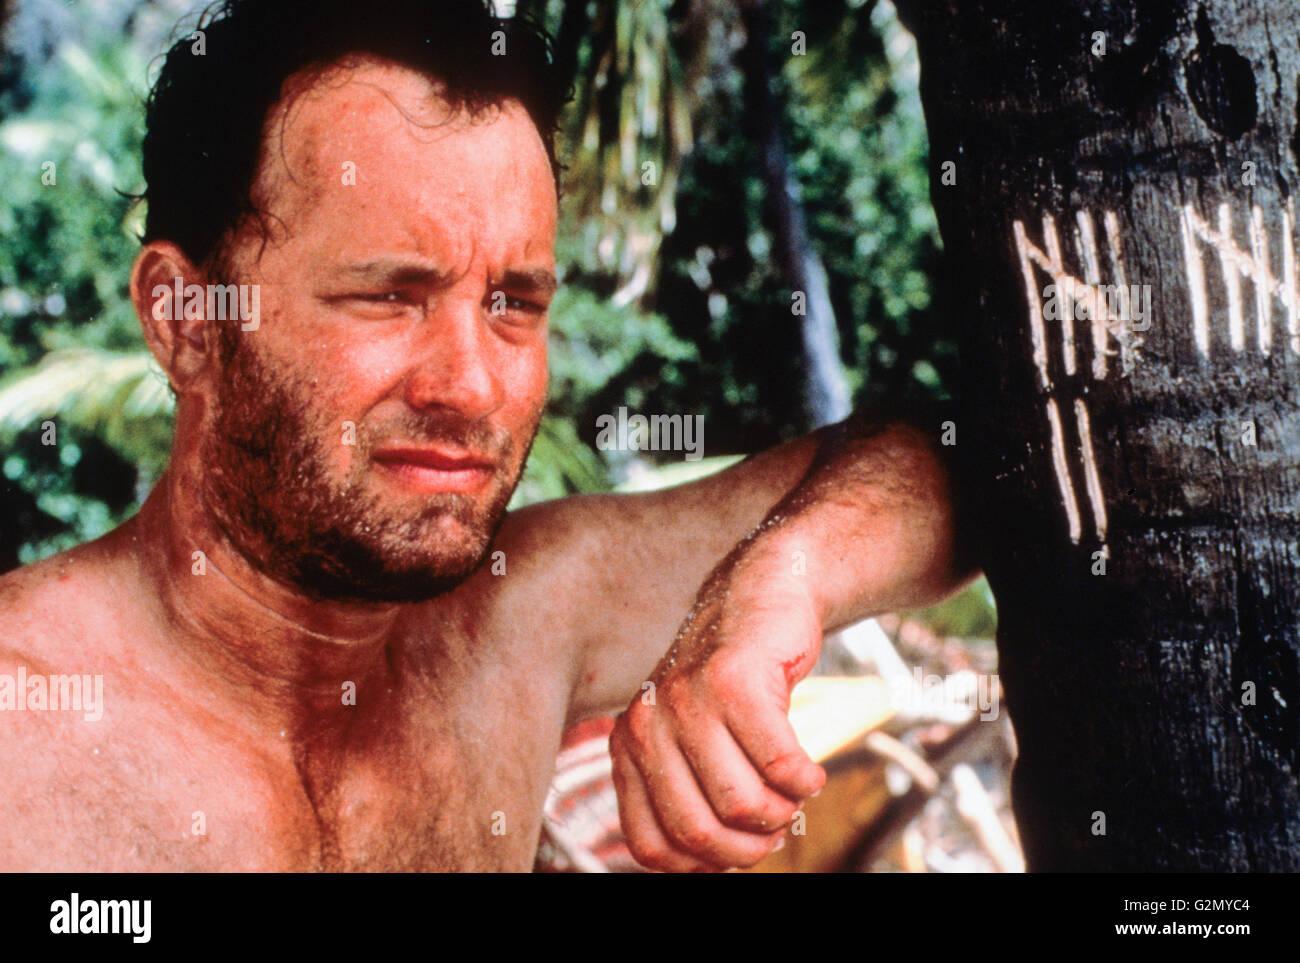 tom hanks,cast away,2000 - Stock Image